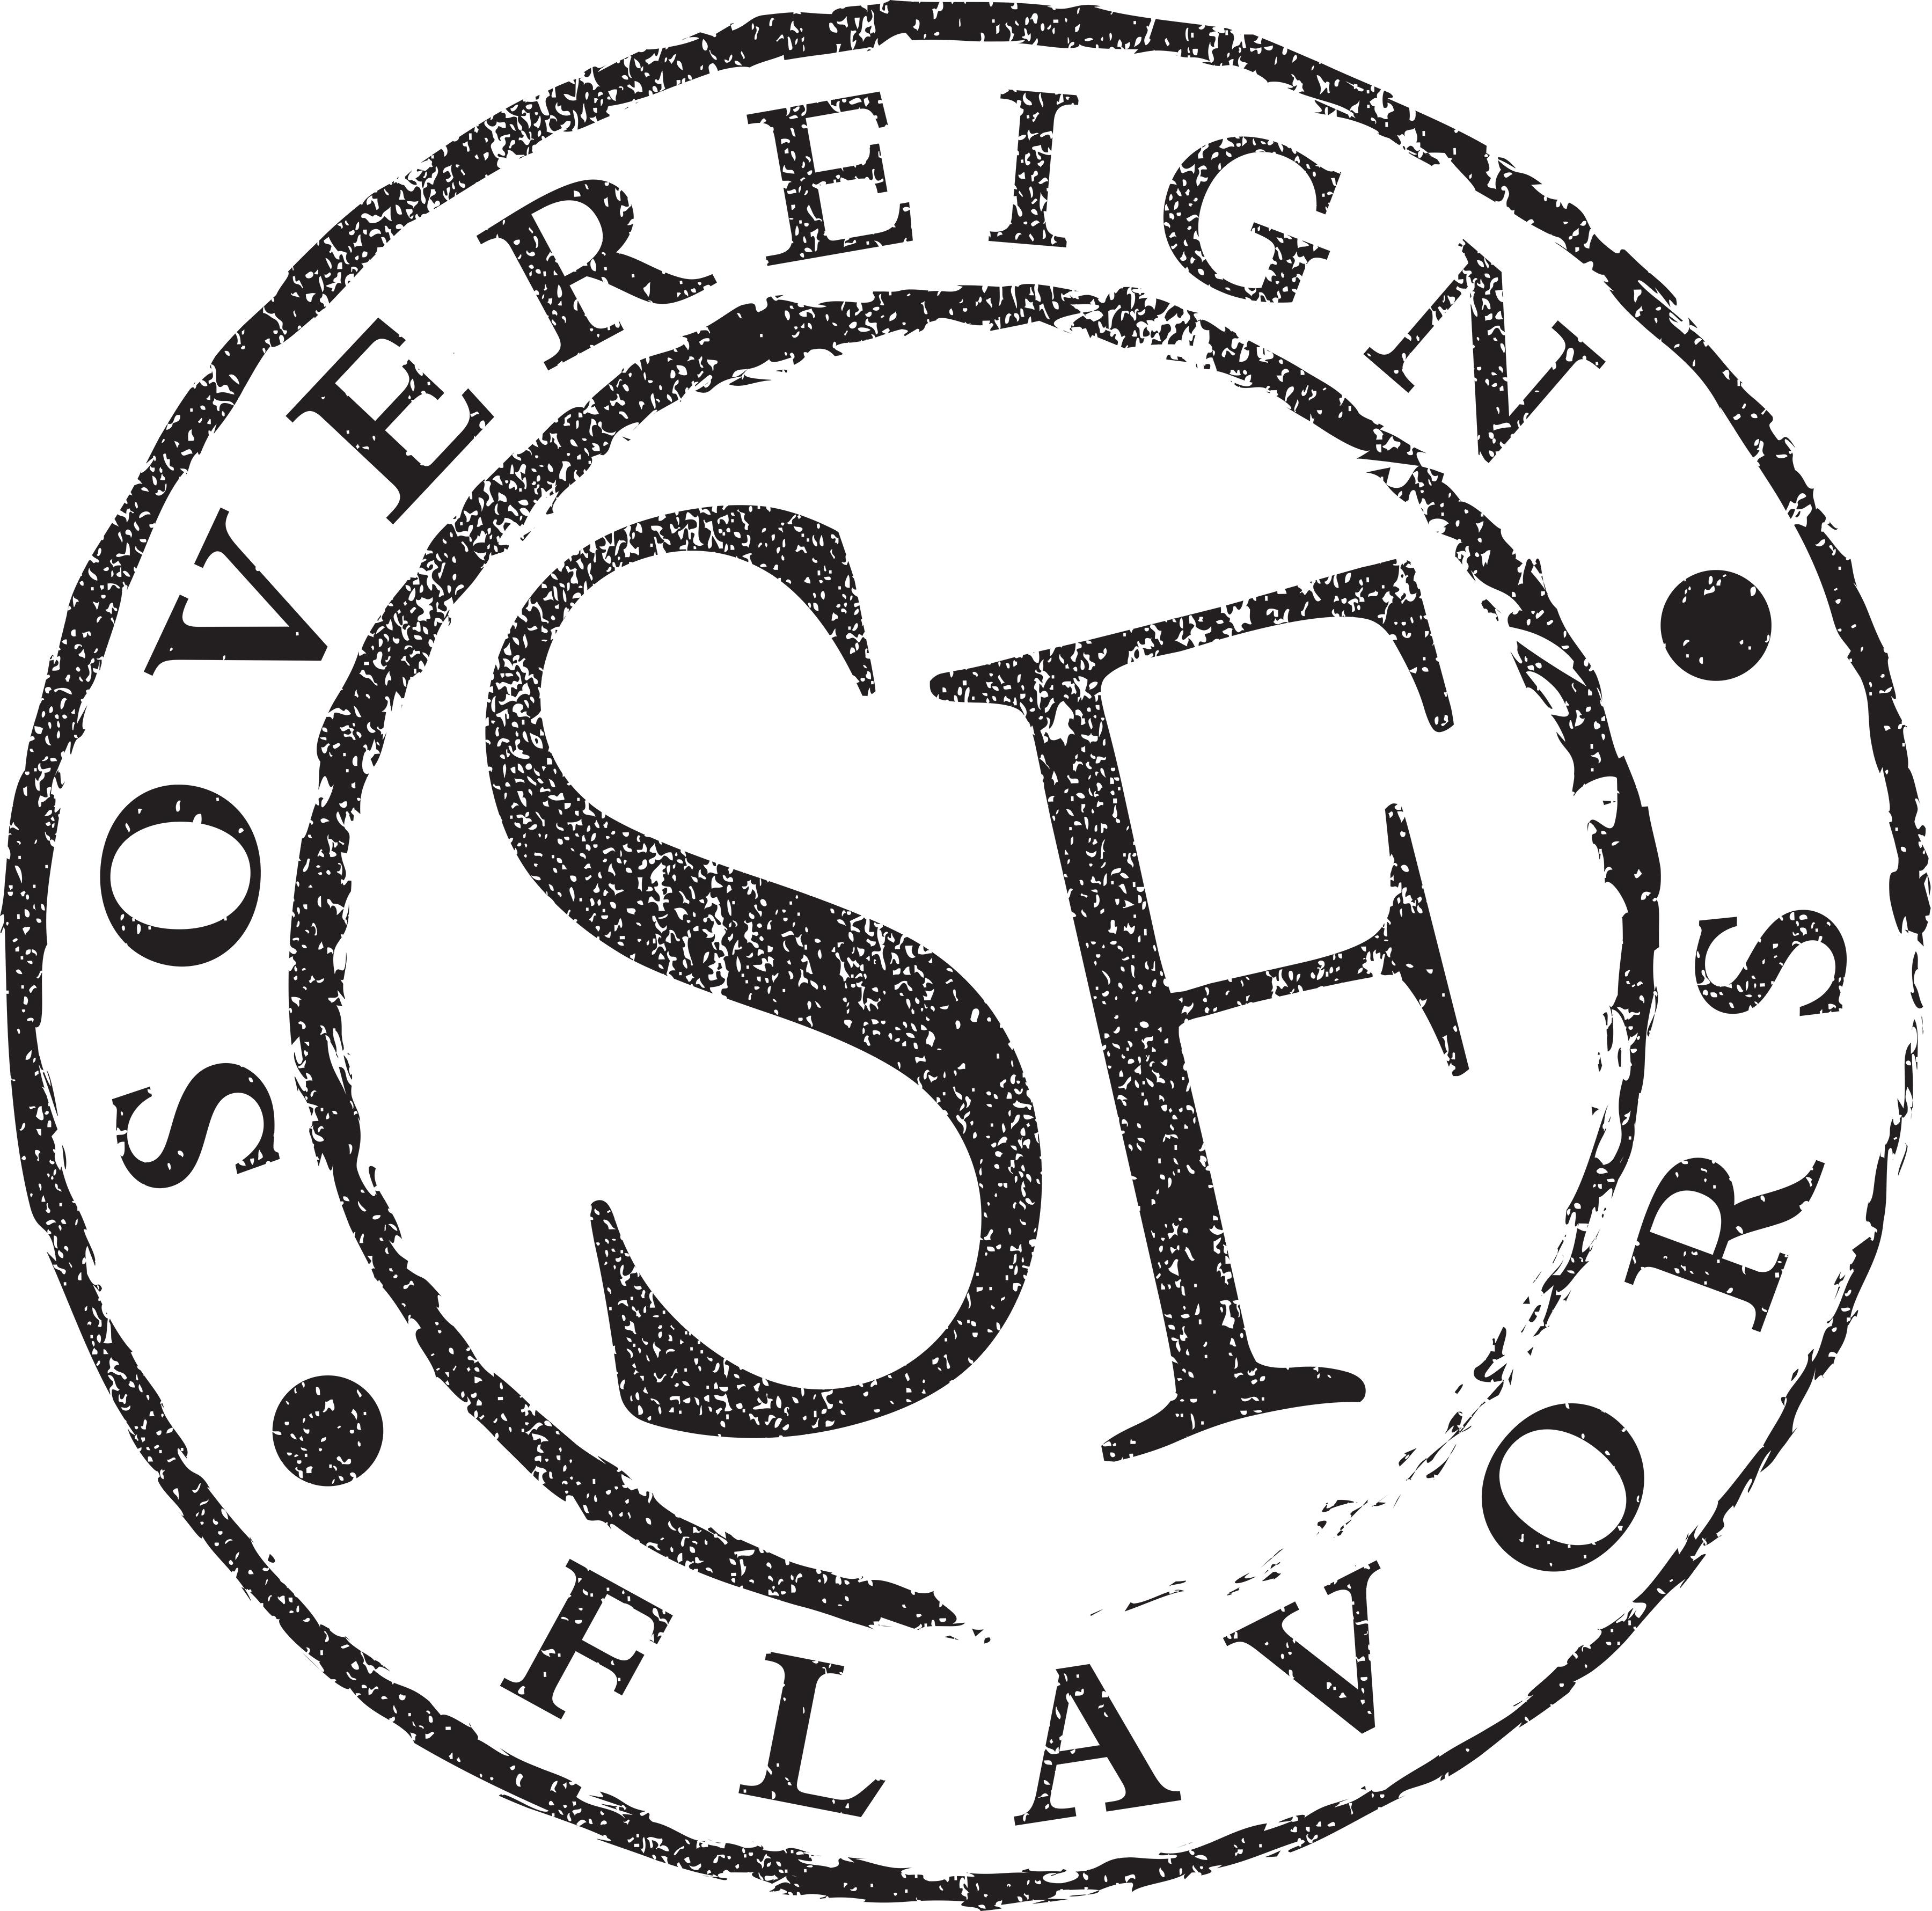 Sovereign Flavors, Inc - sponsoring BevNET Live Winter 2019